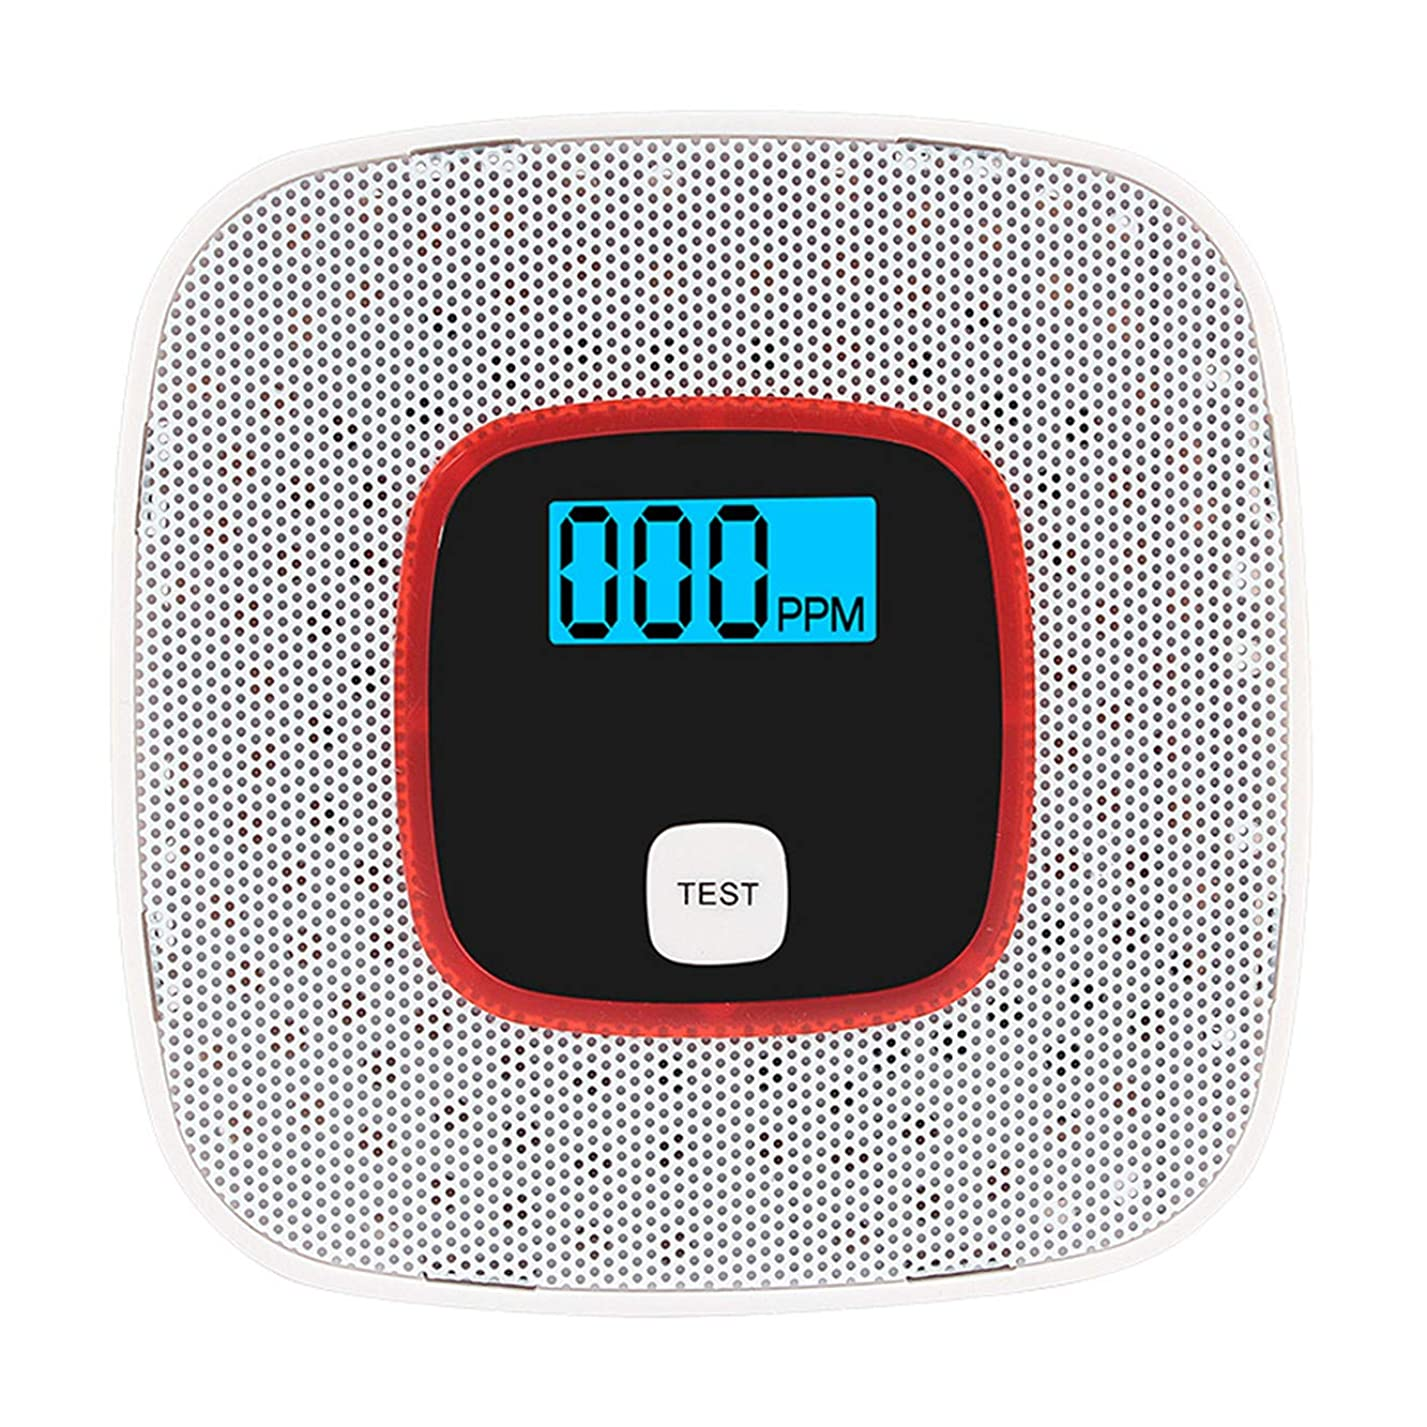 空ドック預言者都市ガス ガス警報器 YP-776 CO警報器 住宅用 火災警報器 (熱式) 複合型